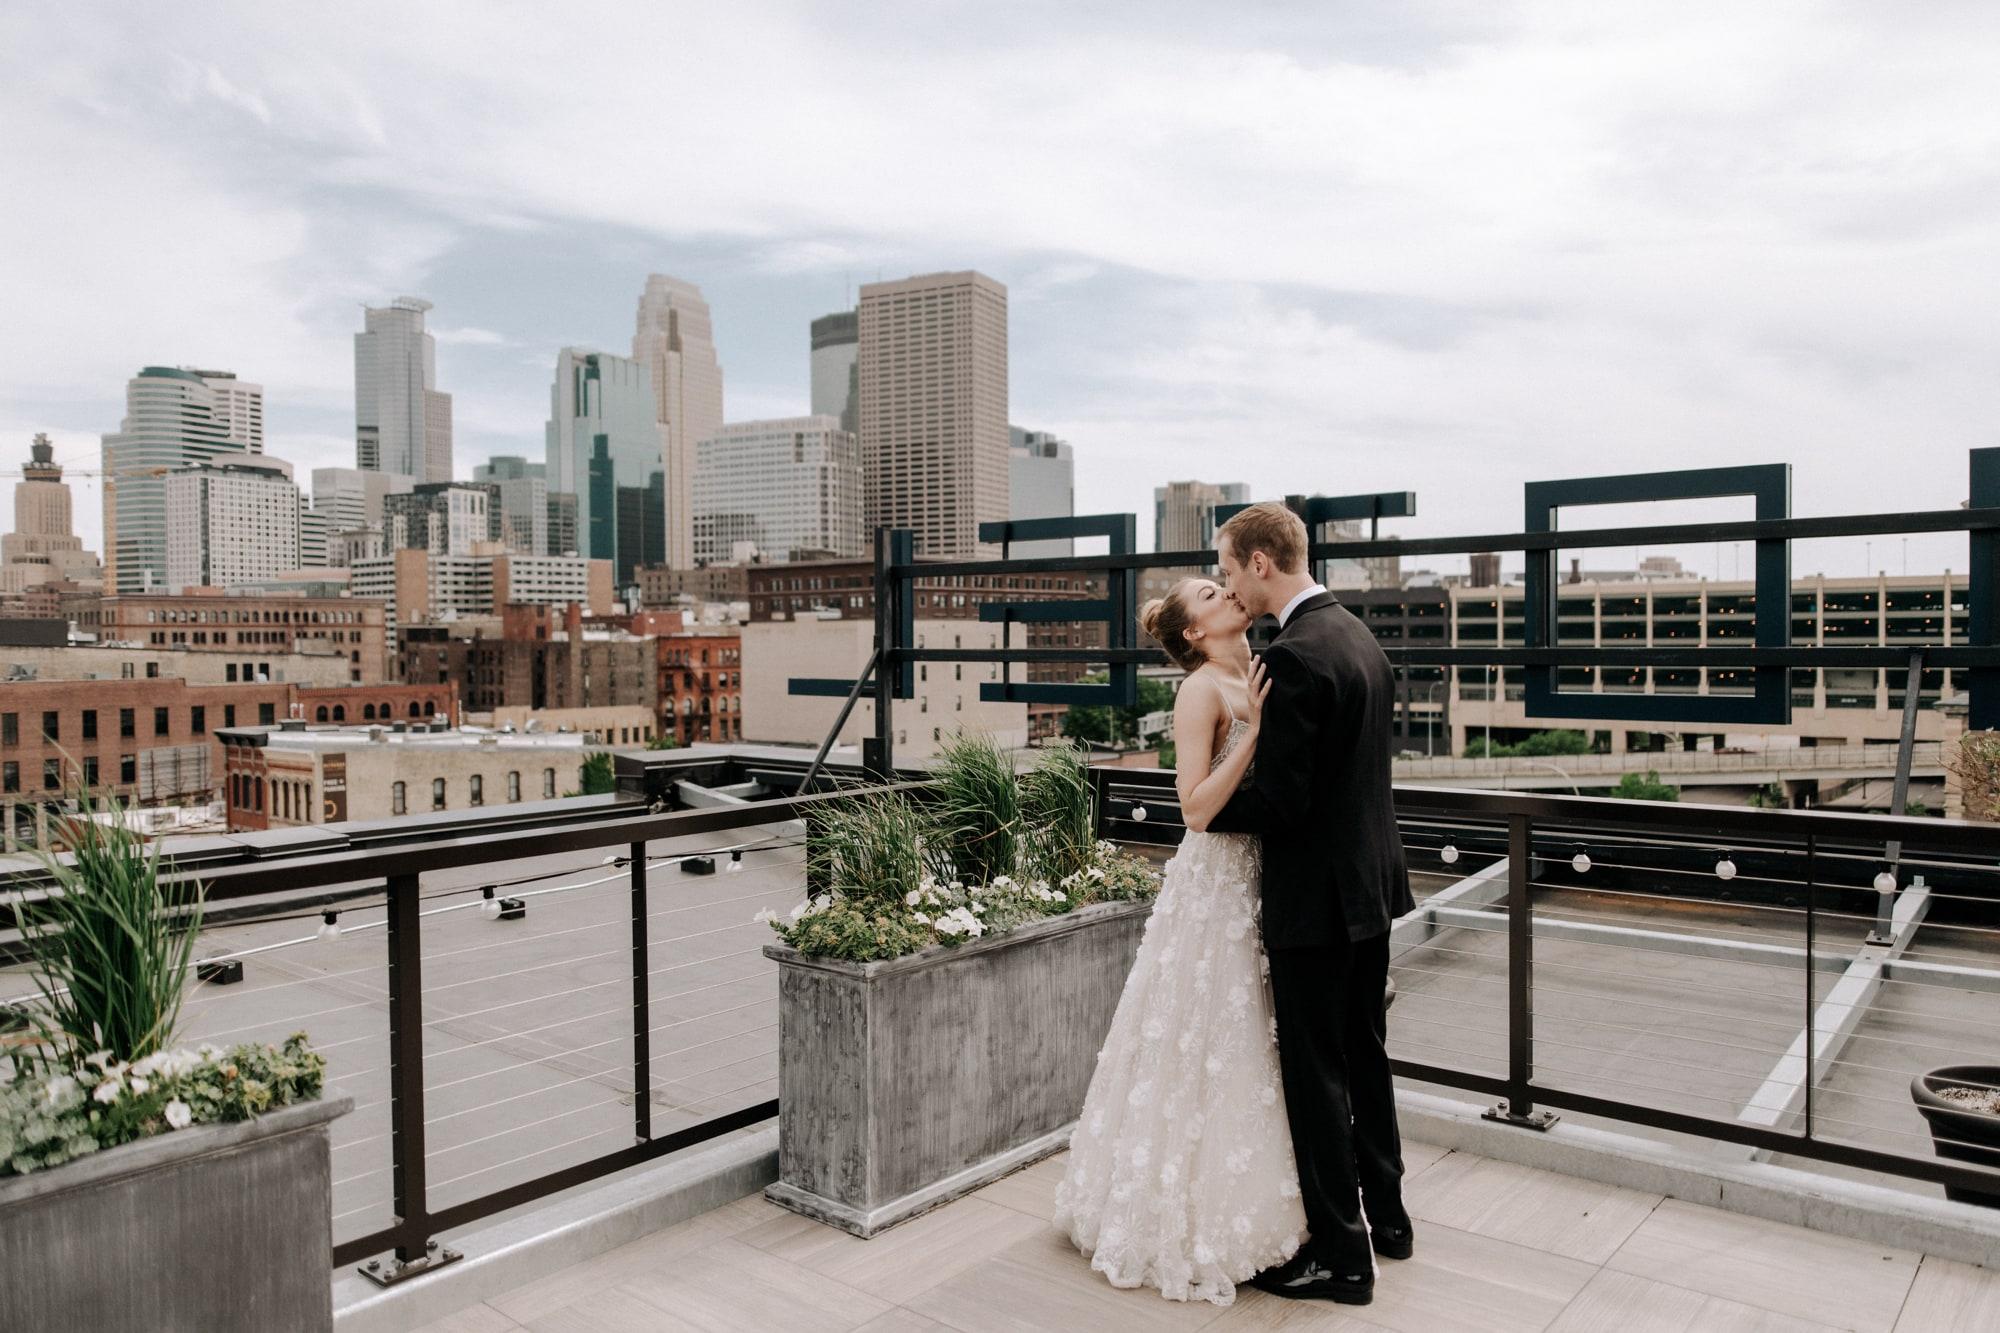 MIA-Minneapolis-Institute-Art-Summer-Wedding-_12.jpg